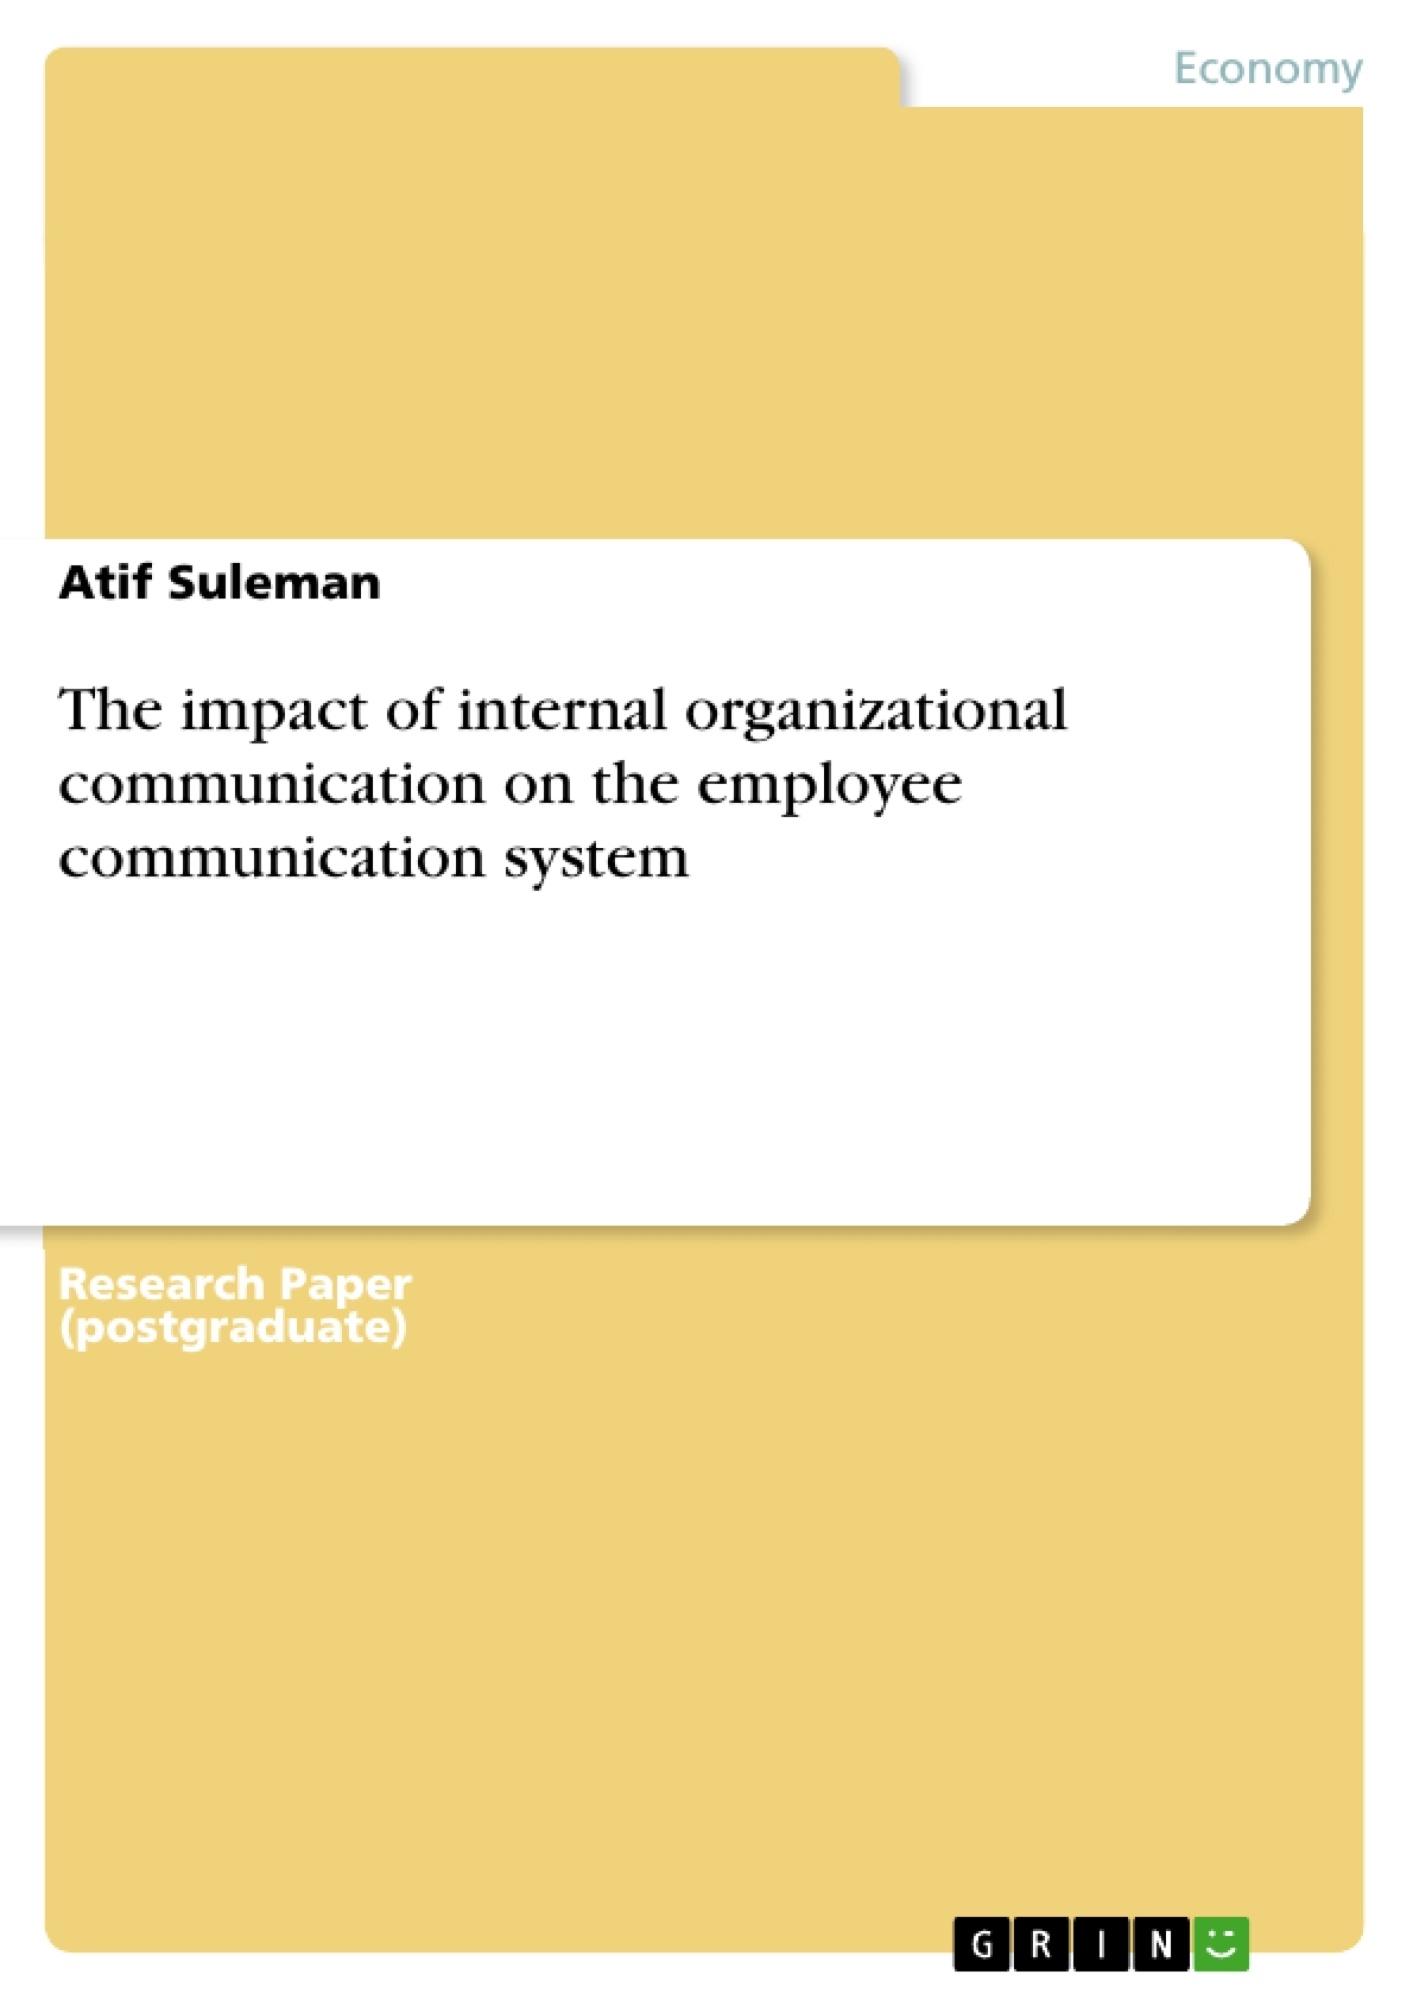 Title: The impact of internal organizational communication on the employee communication system